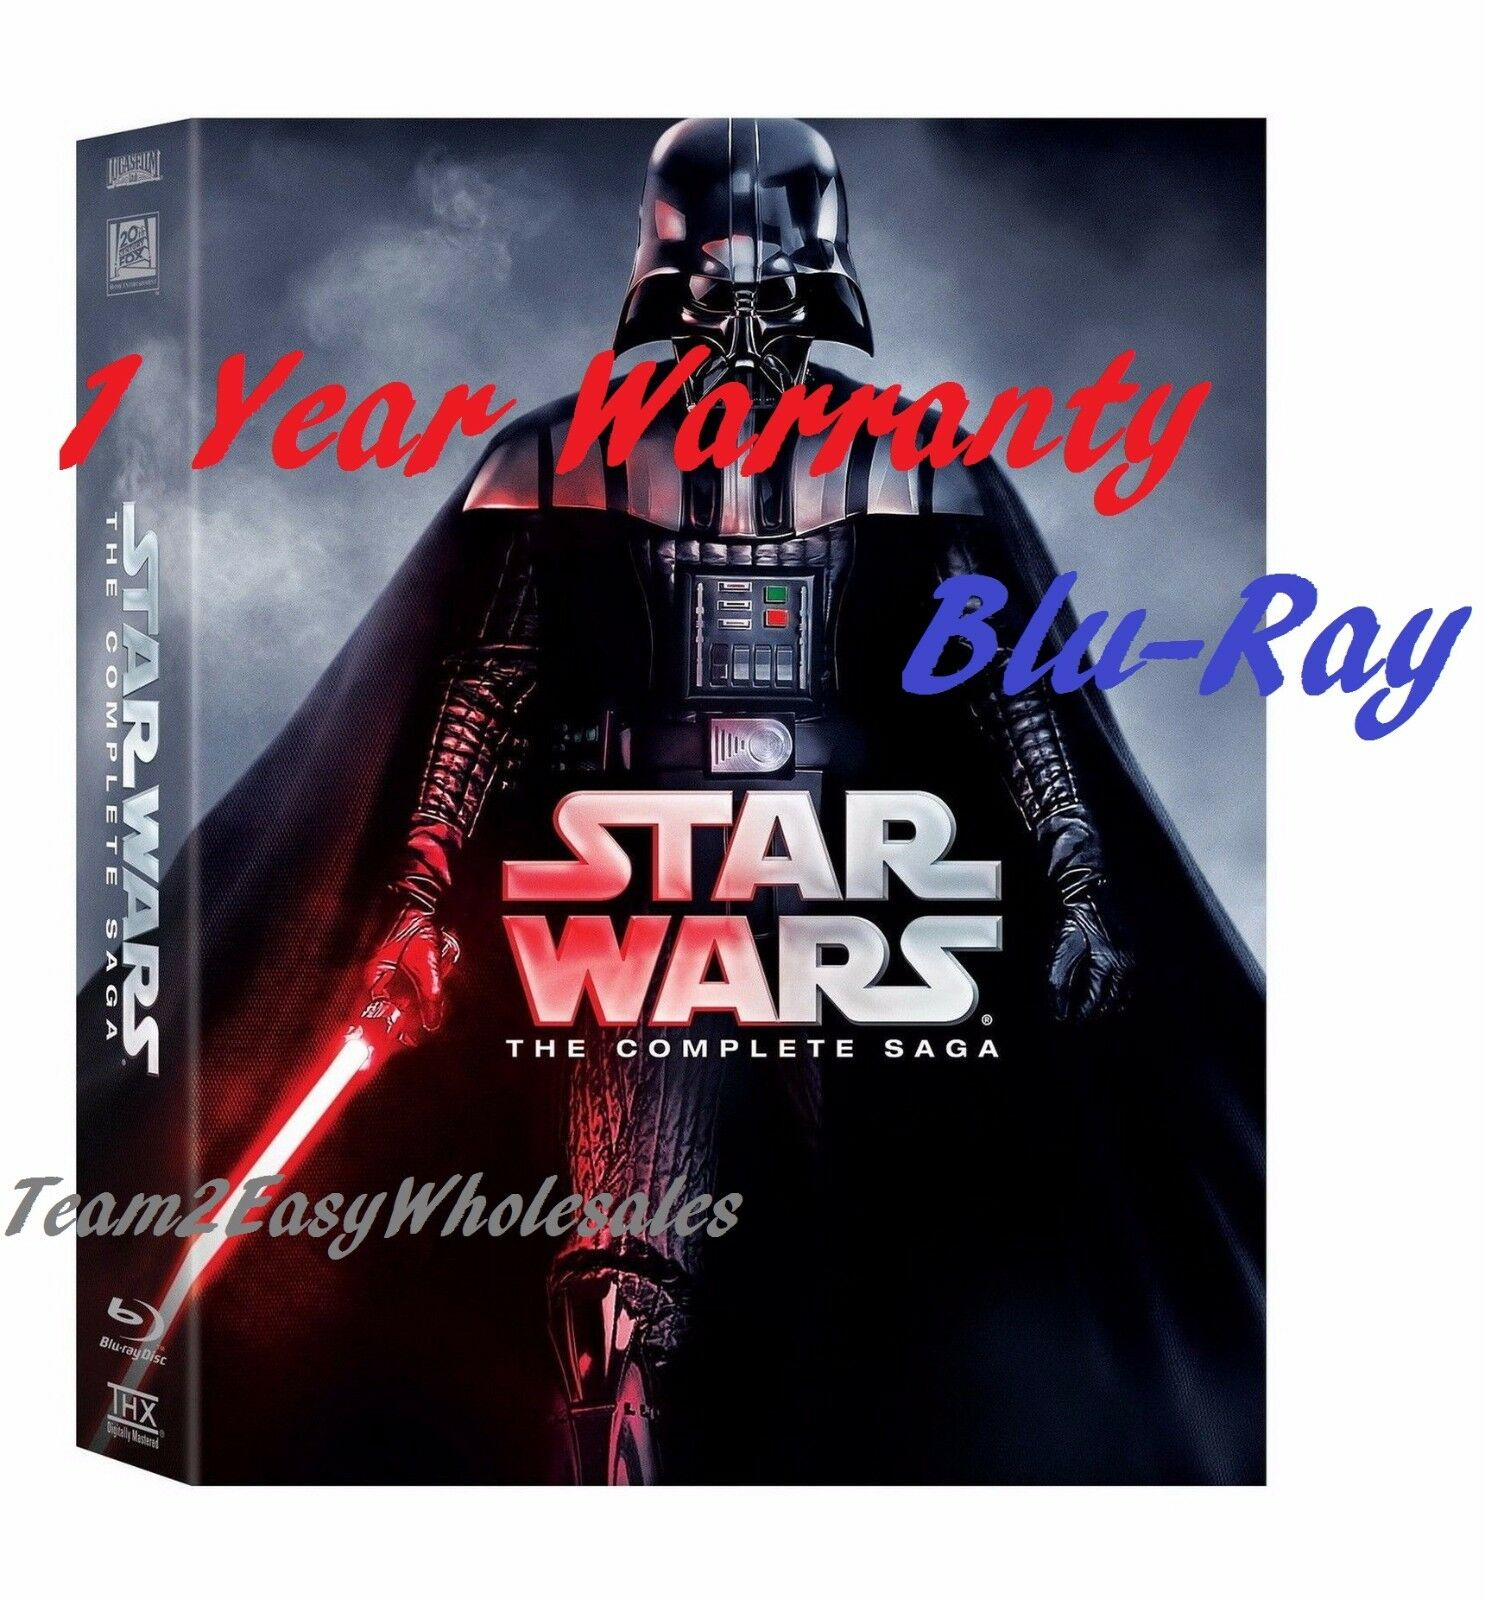 Купить BRAND NEW Star Wars: Complete Saga episodes 1-6 Movie Box Set 9-Disc Blu-Ray